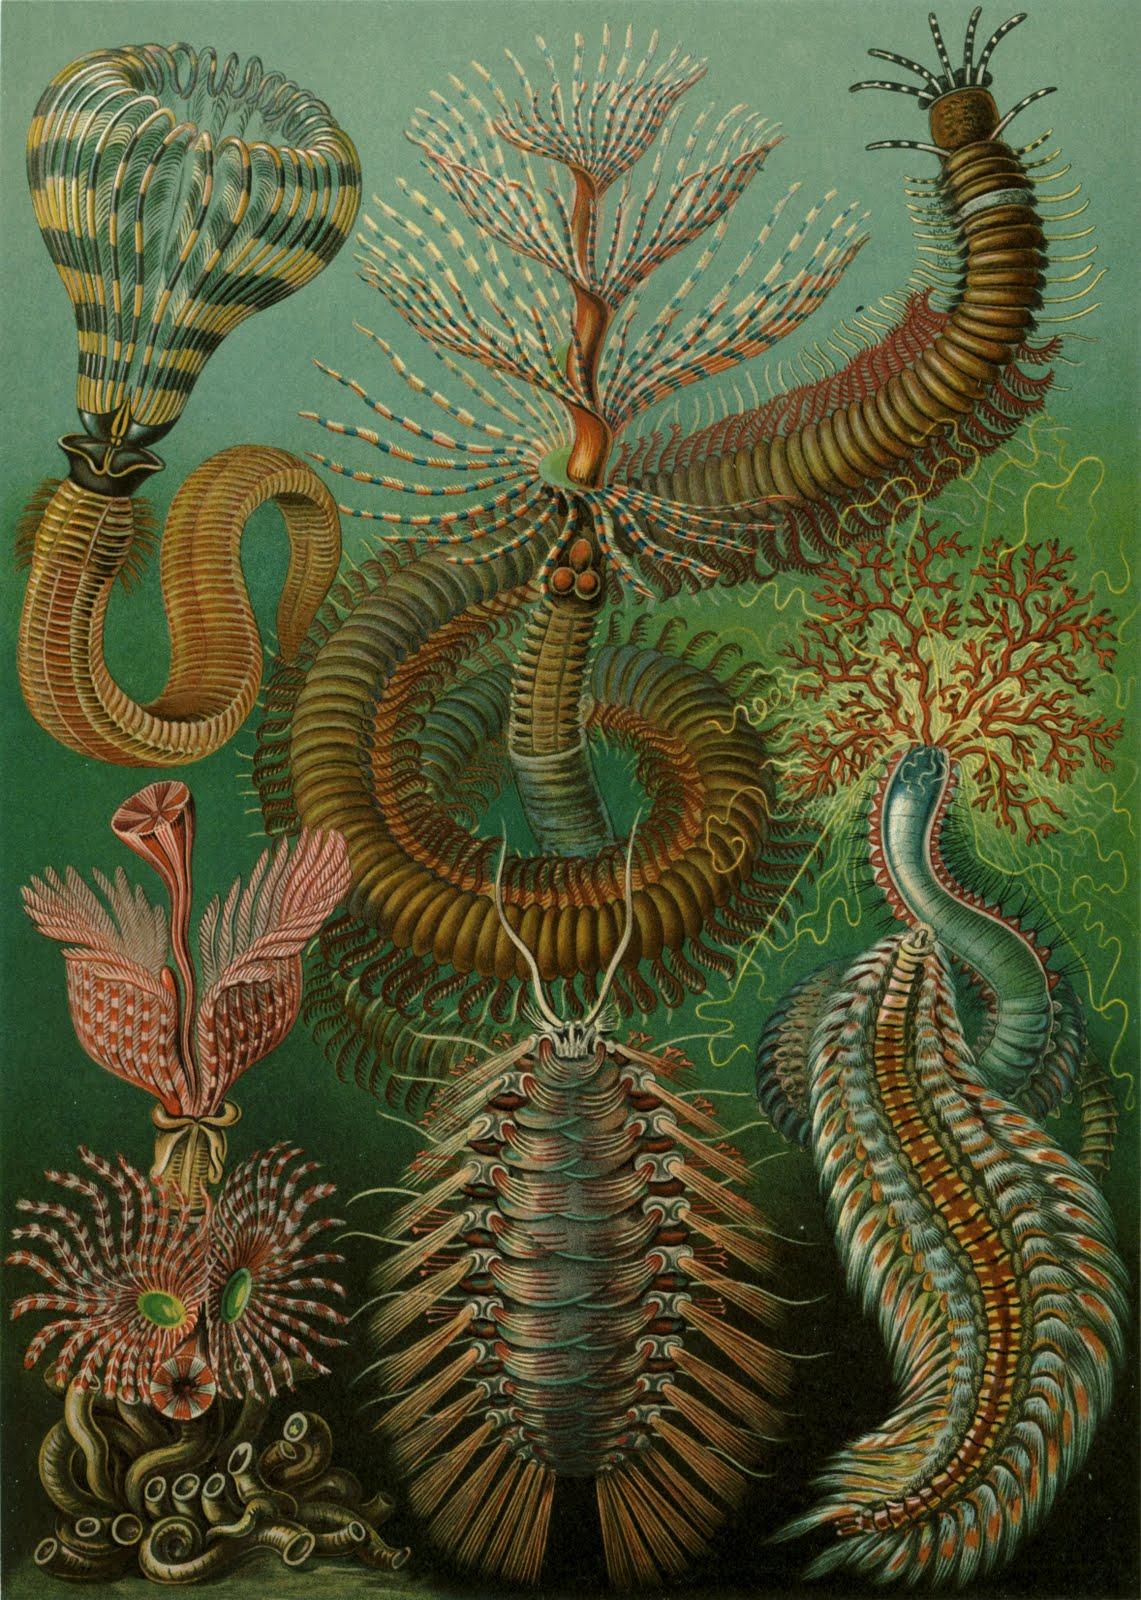 Haeckel-Chaetopoda